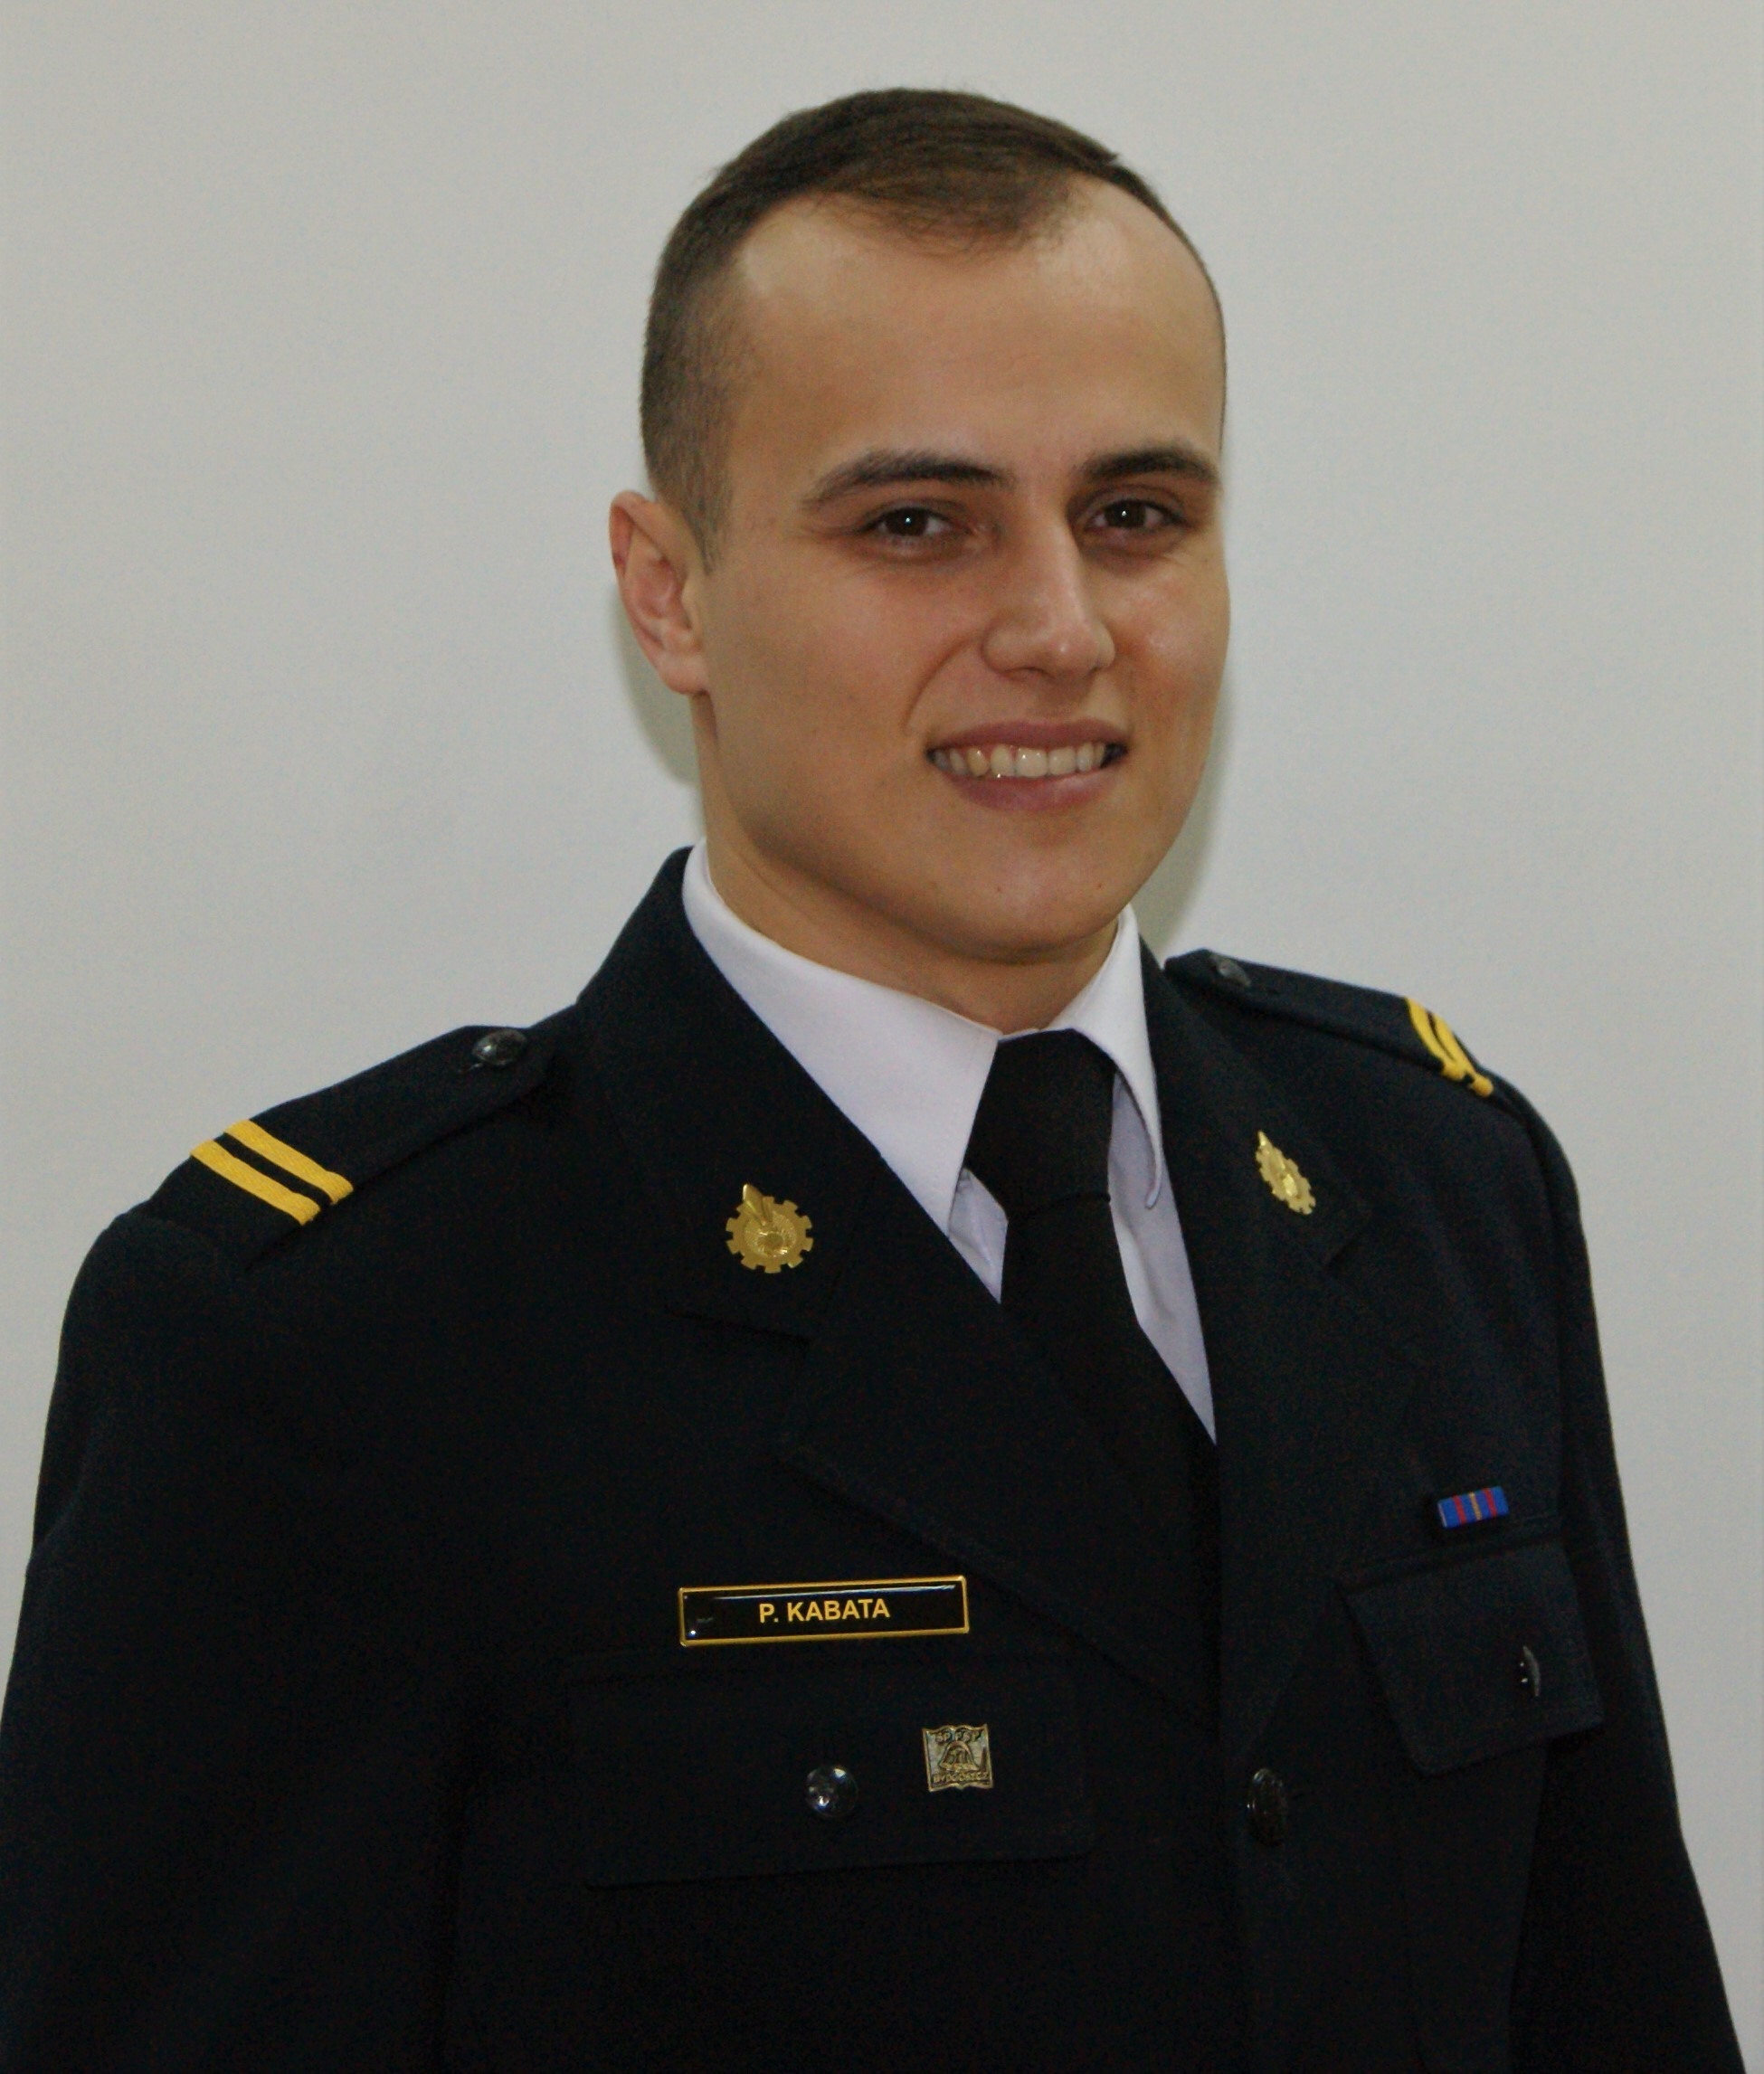 sekc. mgr inż. Piotr Kabata